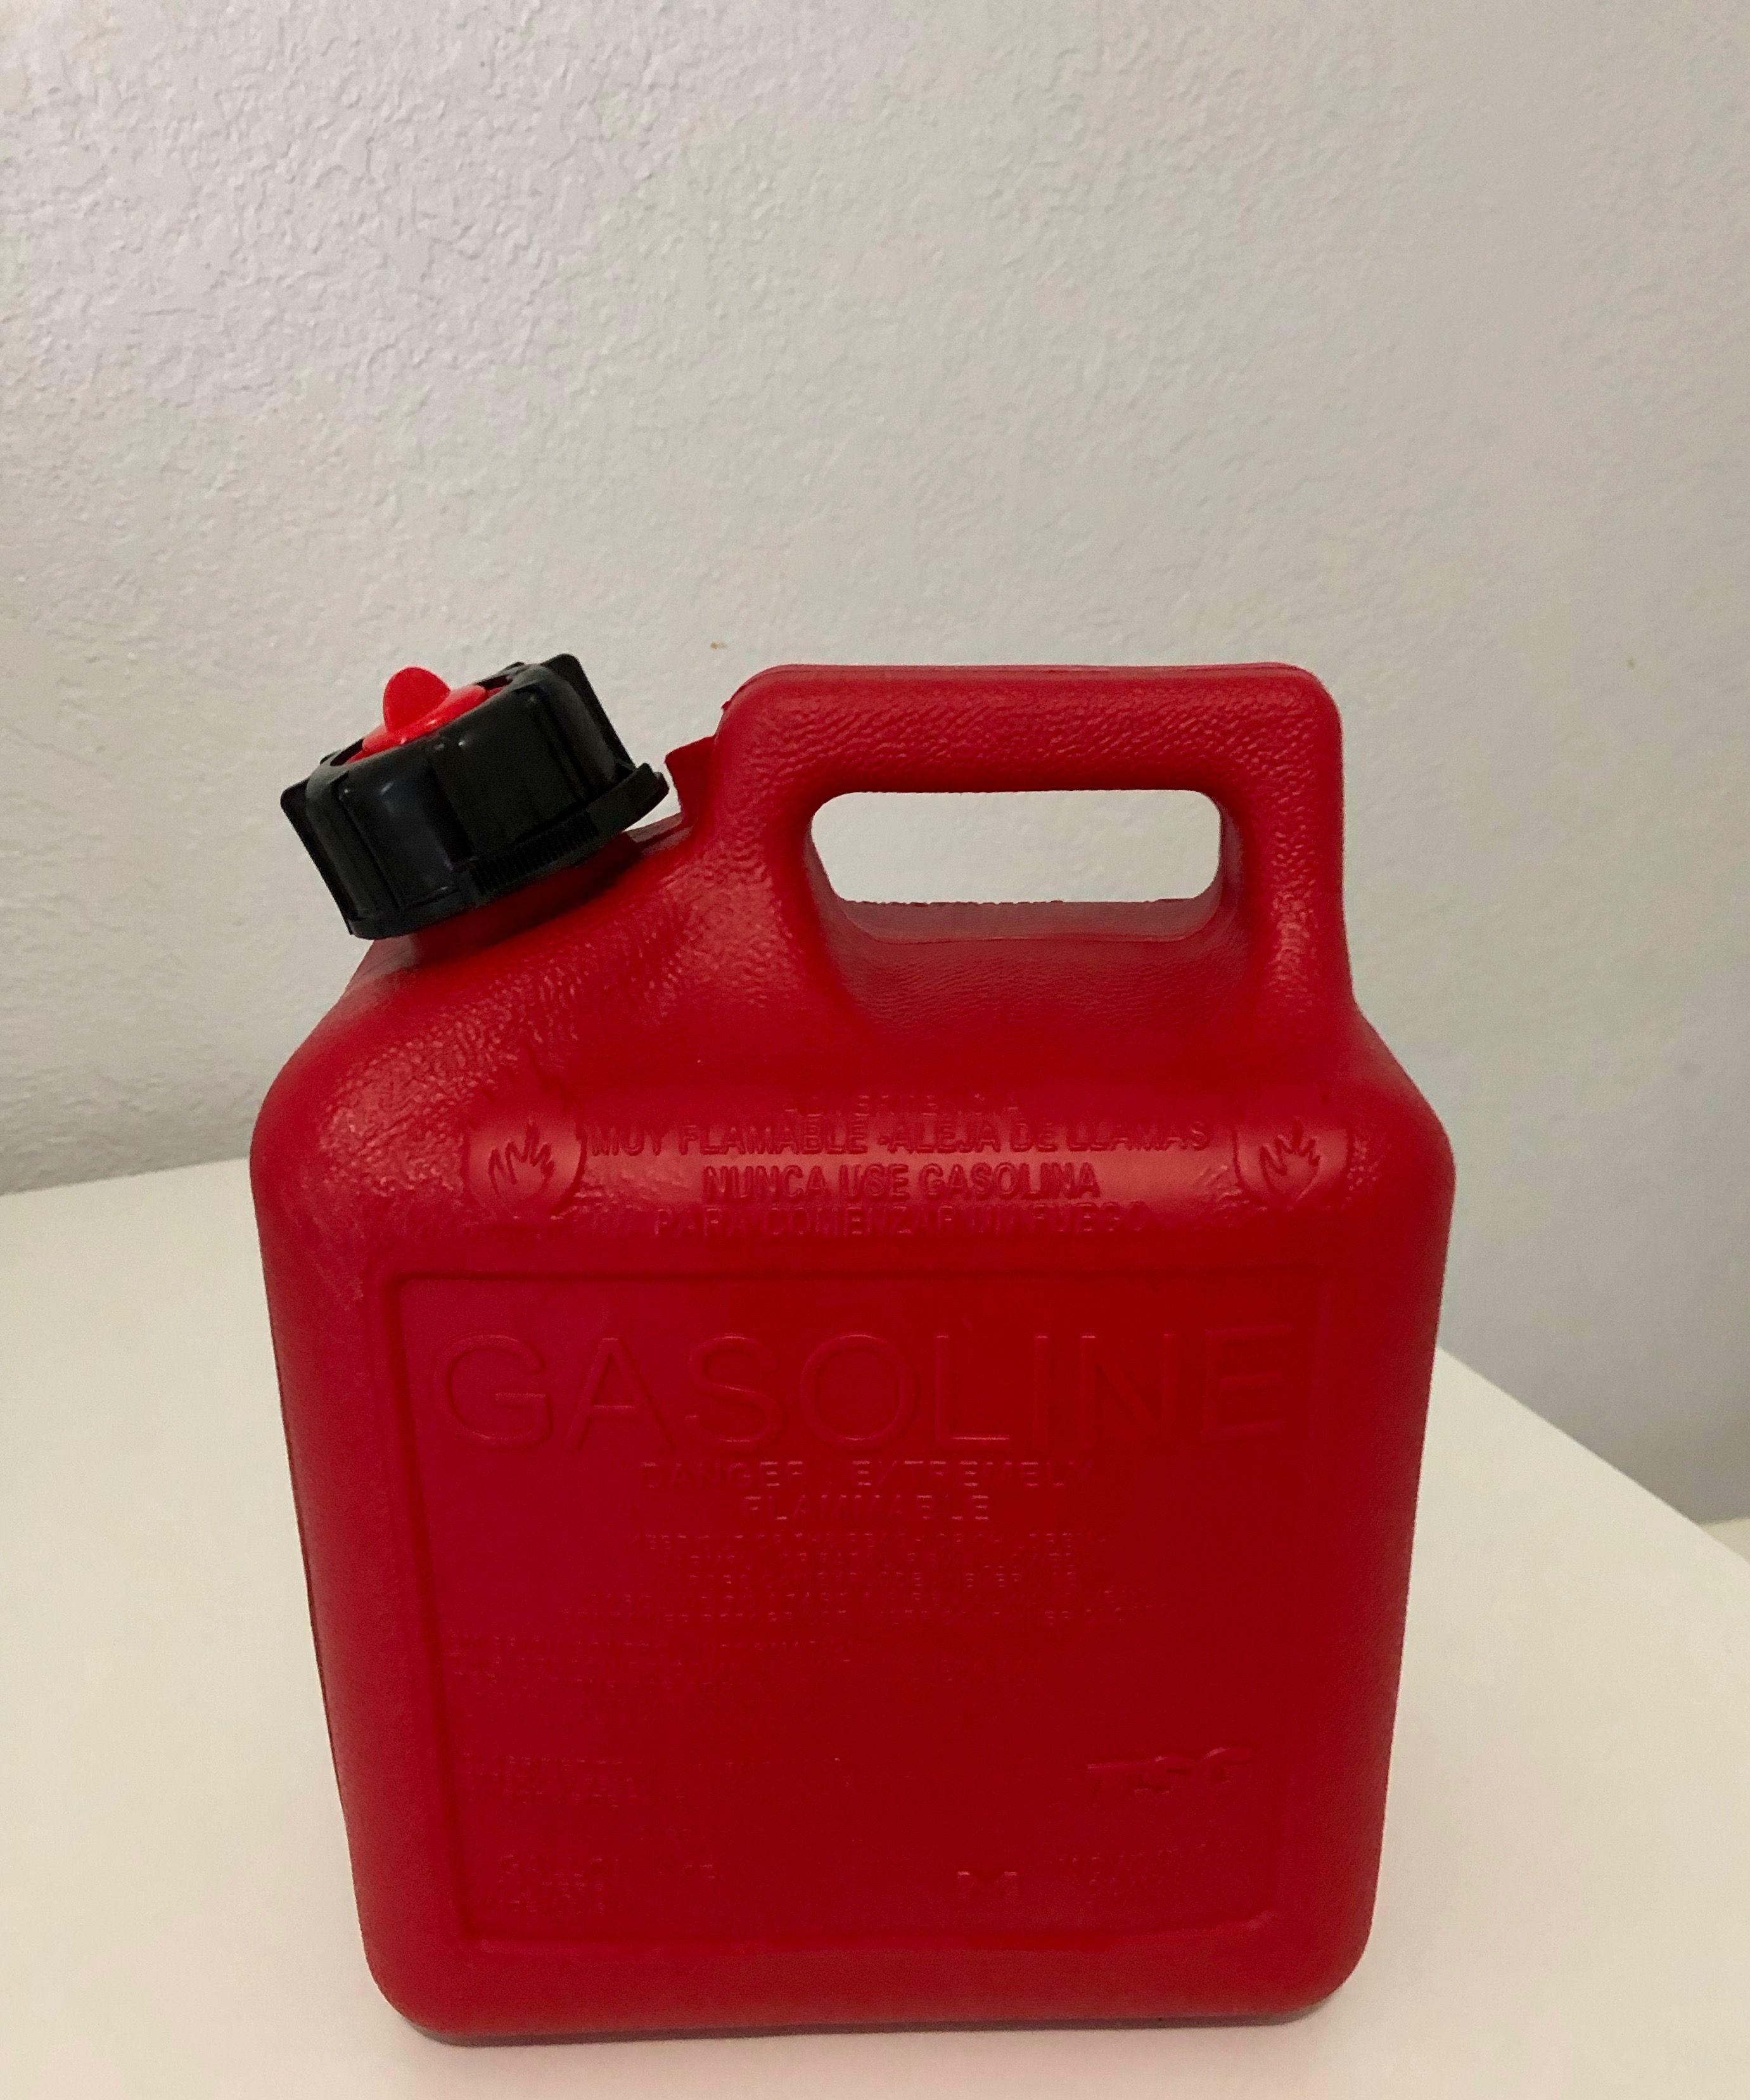 Gasolina O Disel Para Llenar El Tanque Reusable Water Bottle Bottle Water Bottle